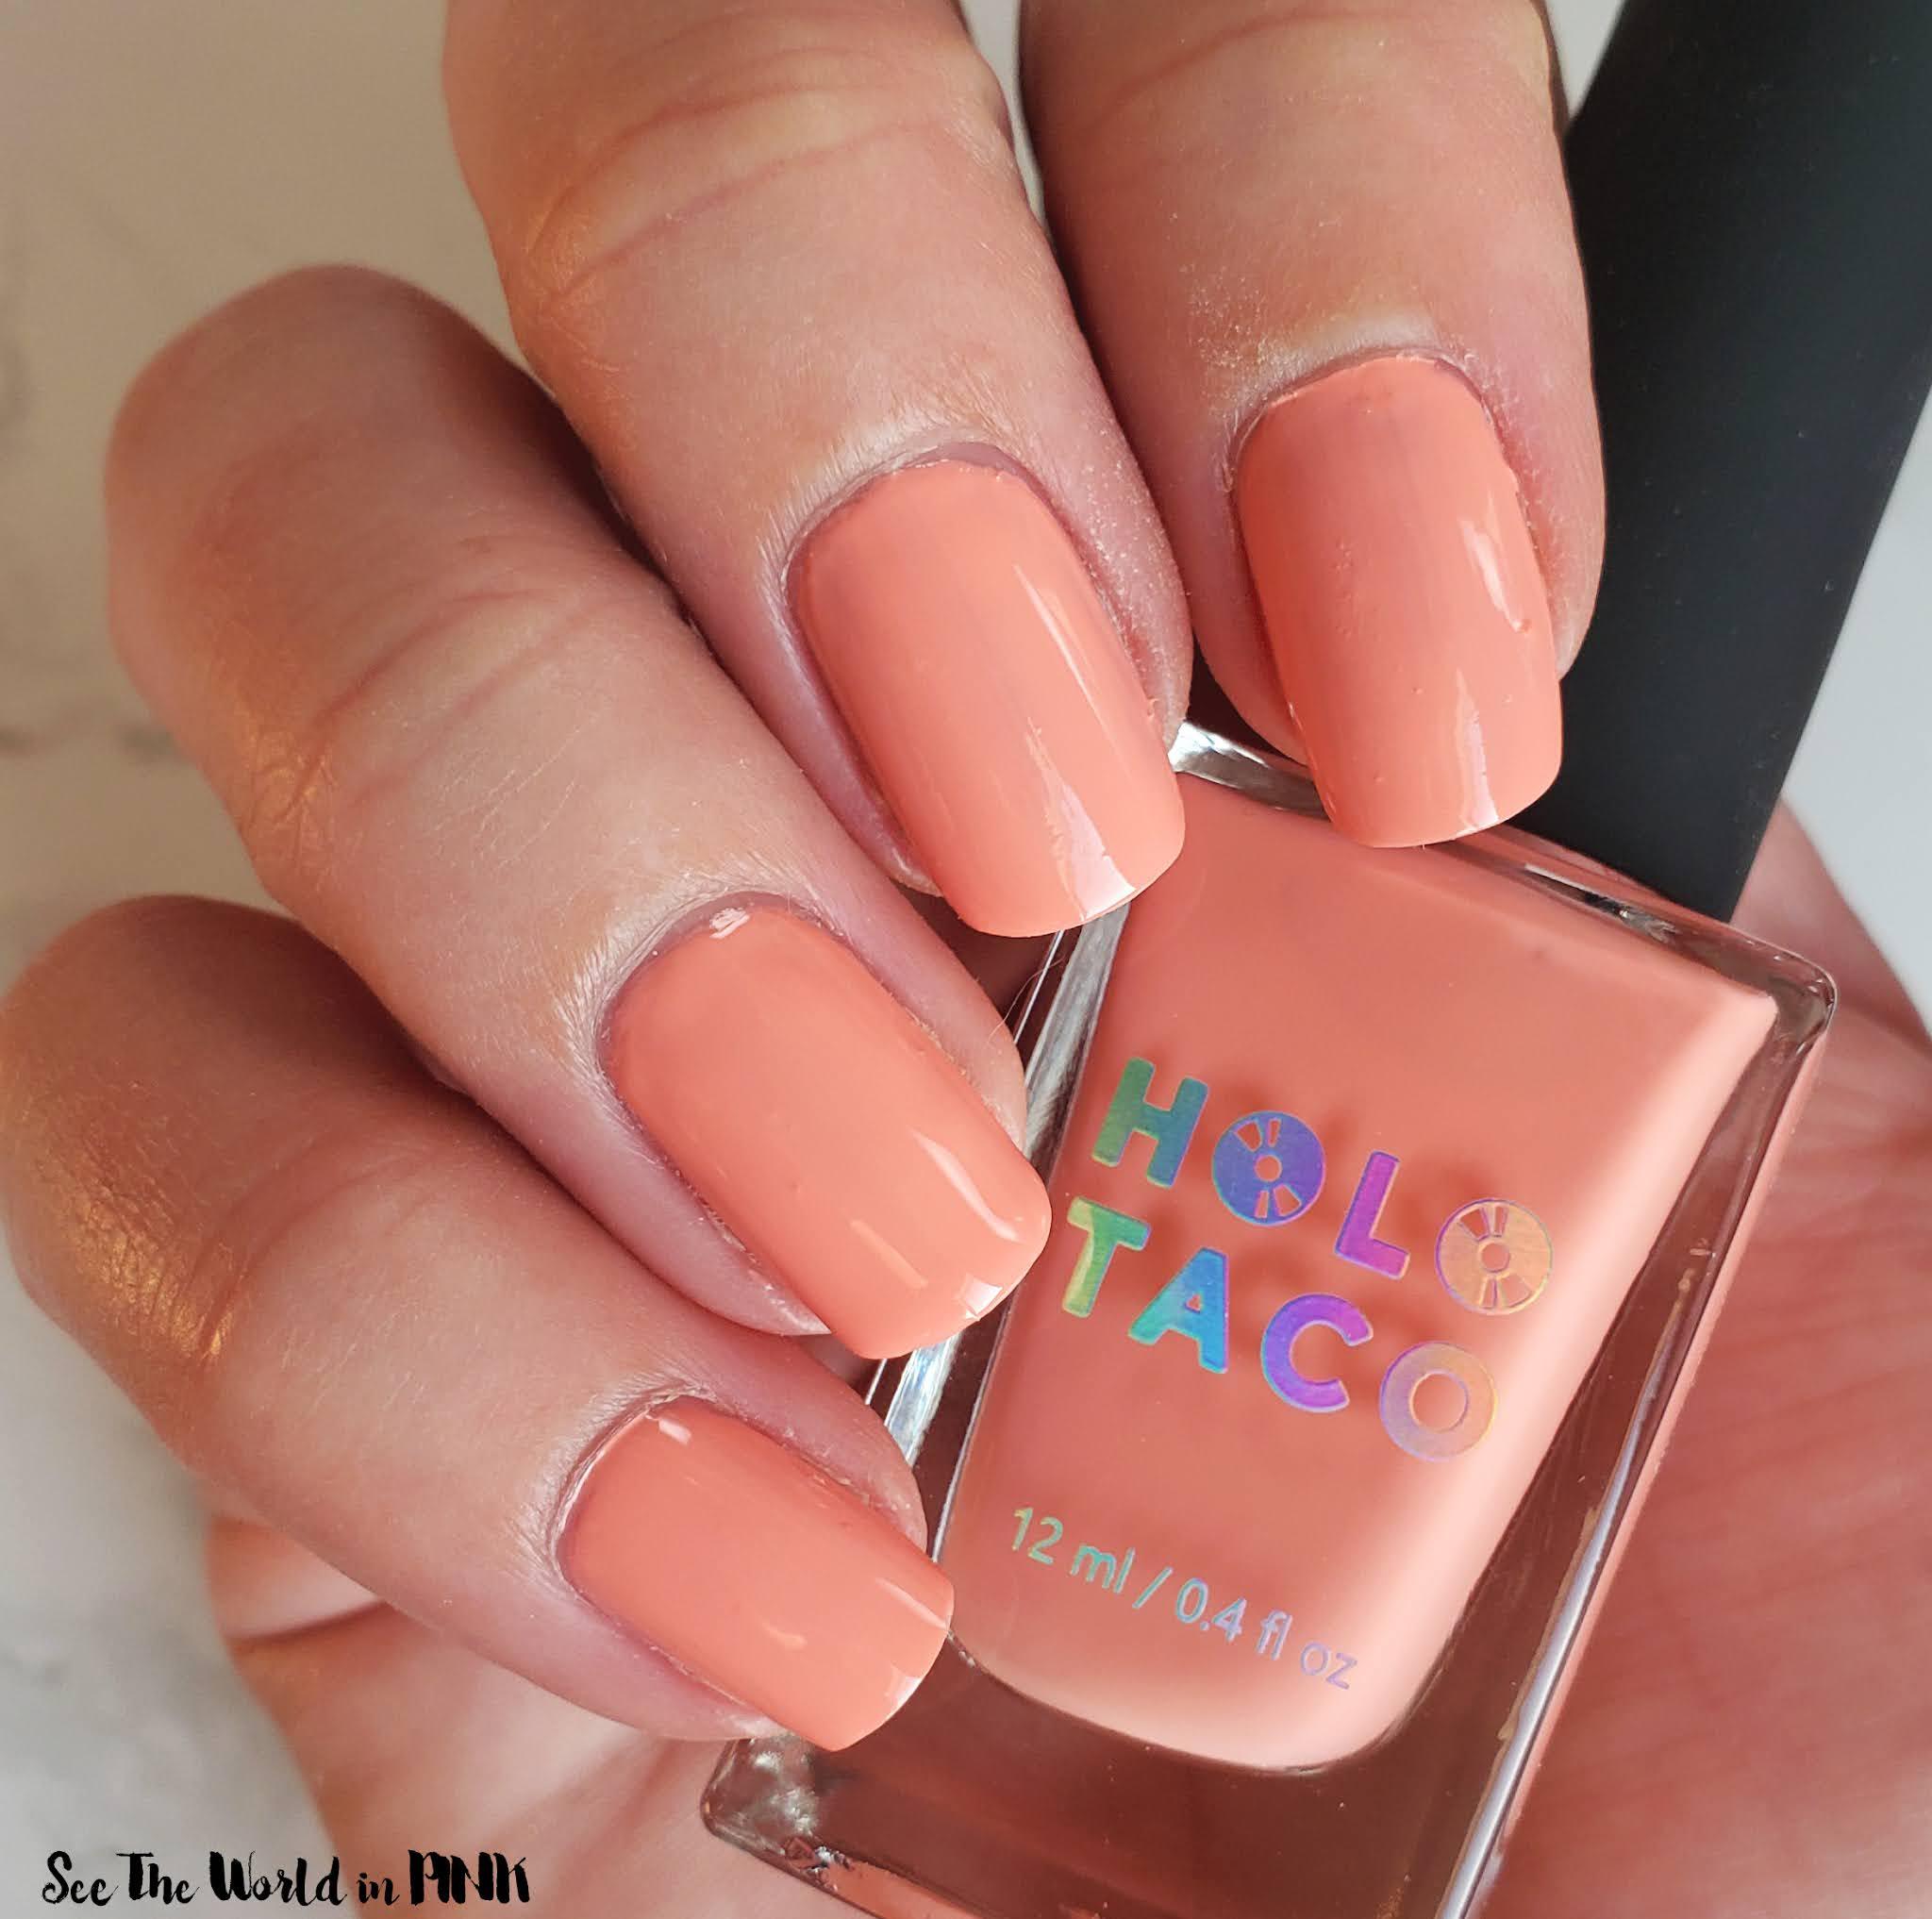 Manicure Monday - Holo Taco Life's A Beach Bundle Swatches